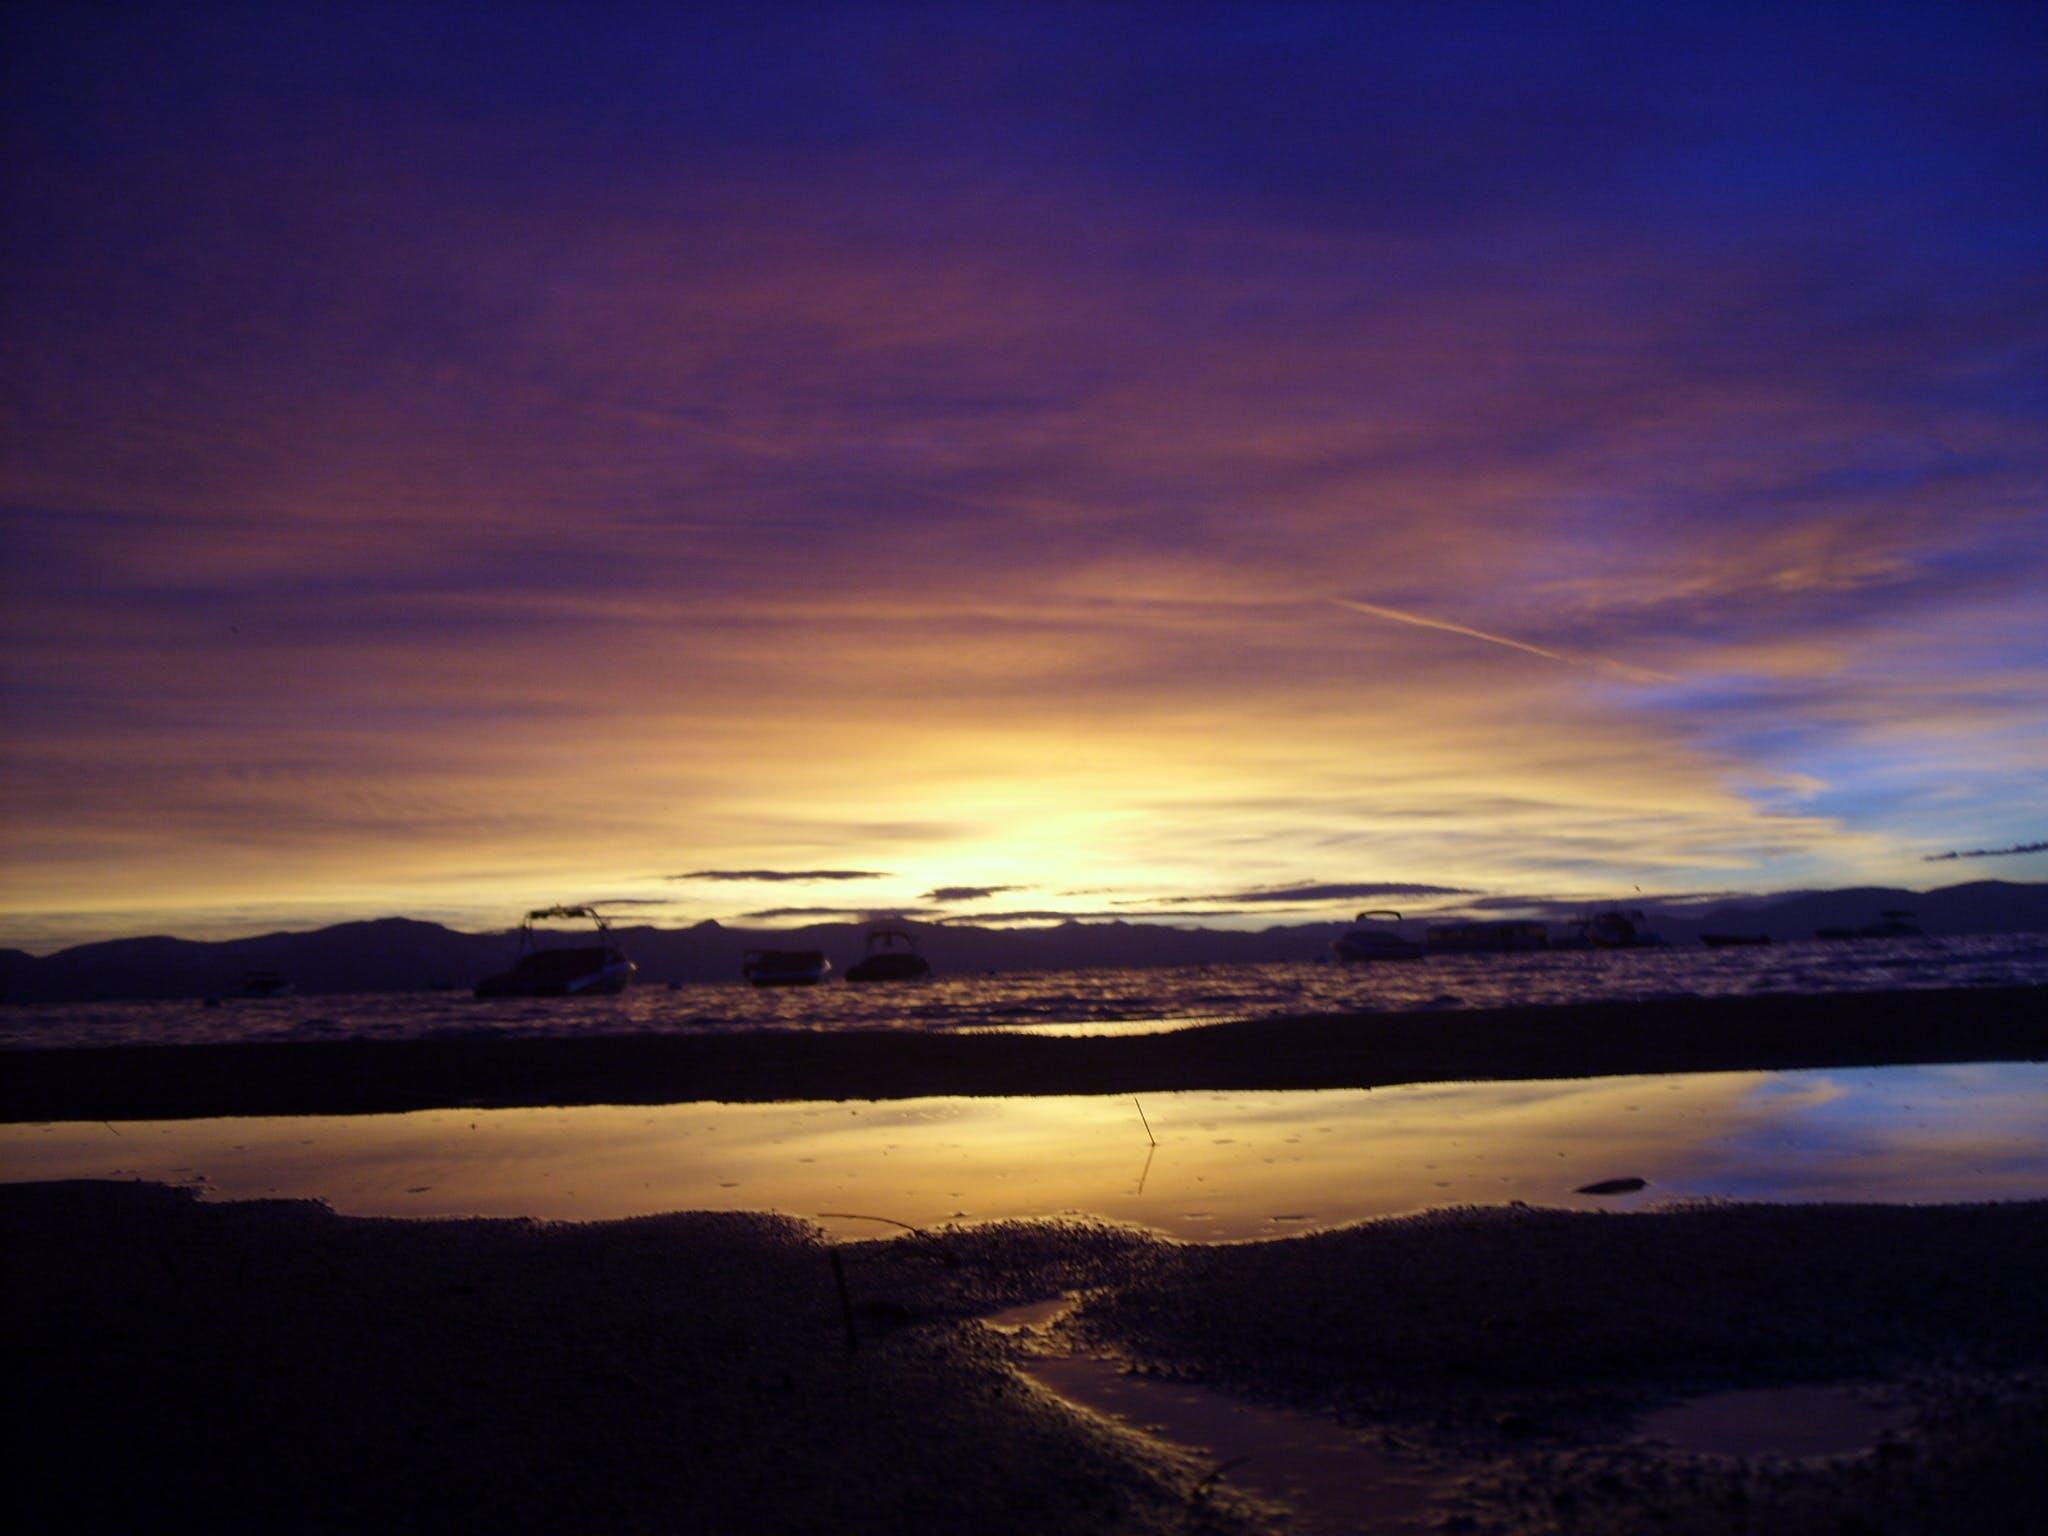 Free stock photo of Joe Leineweber, Lake Tahoe, sunset